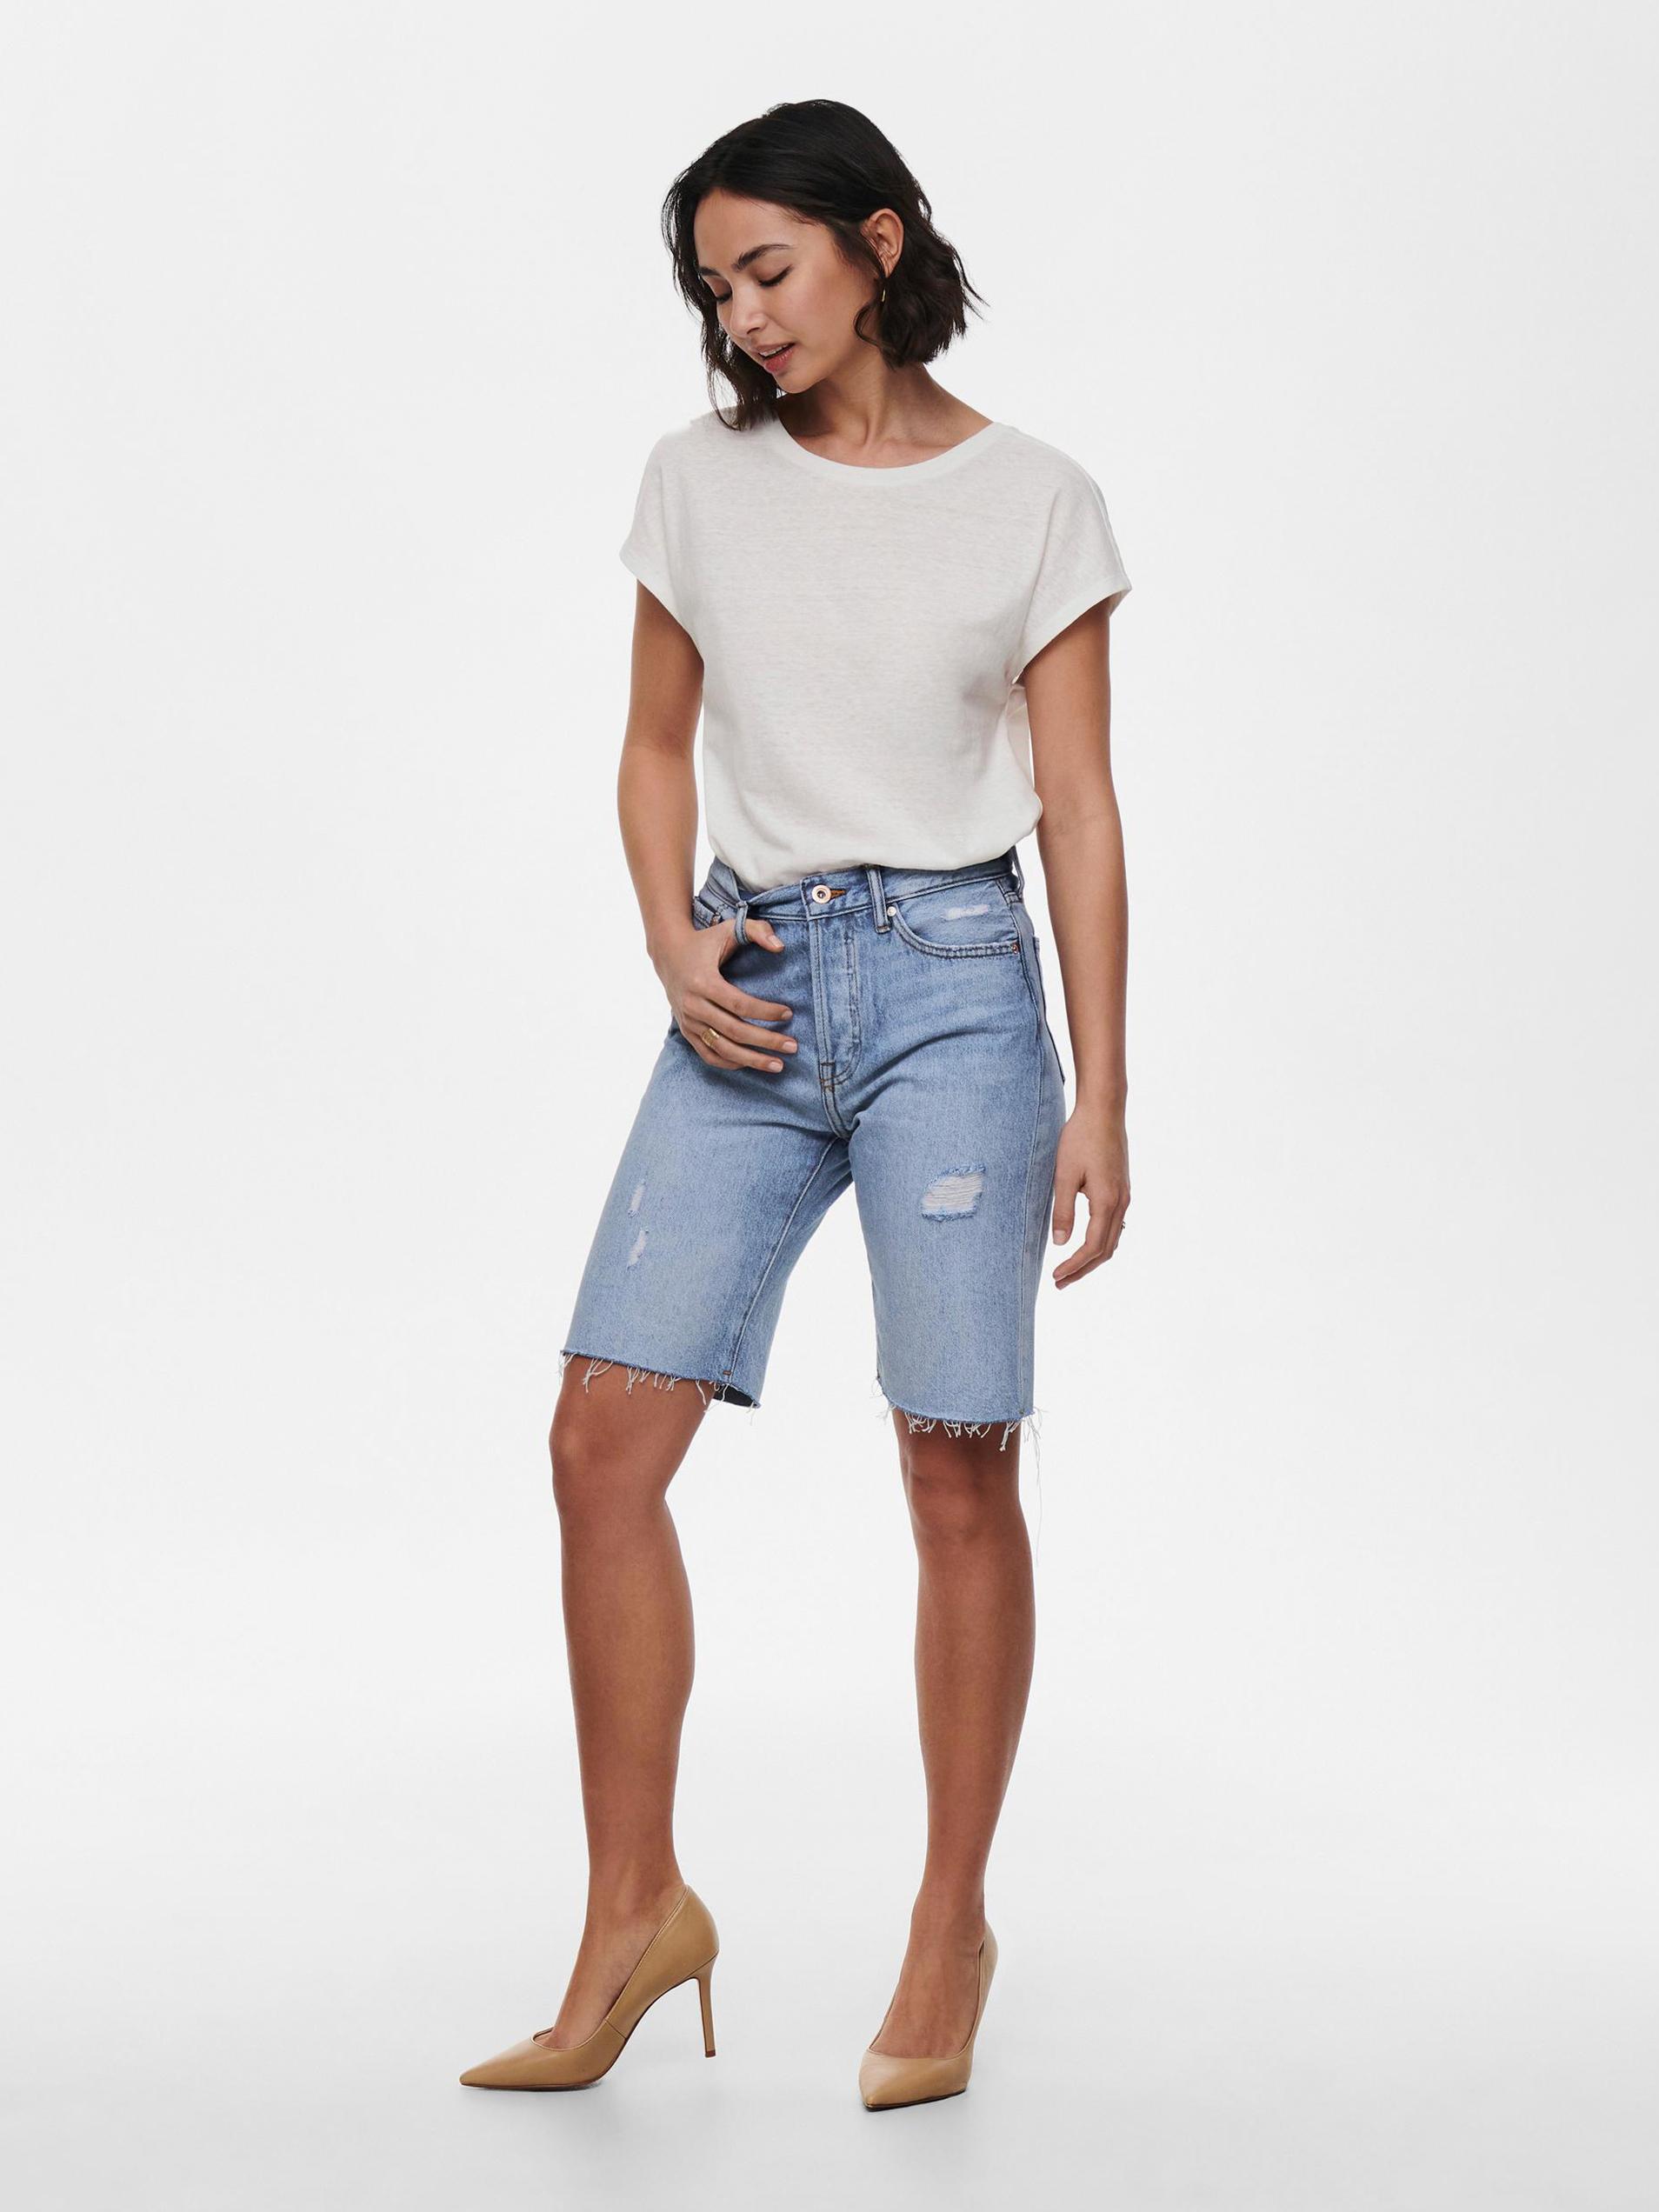 Only bianco da donna maglietta Ama